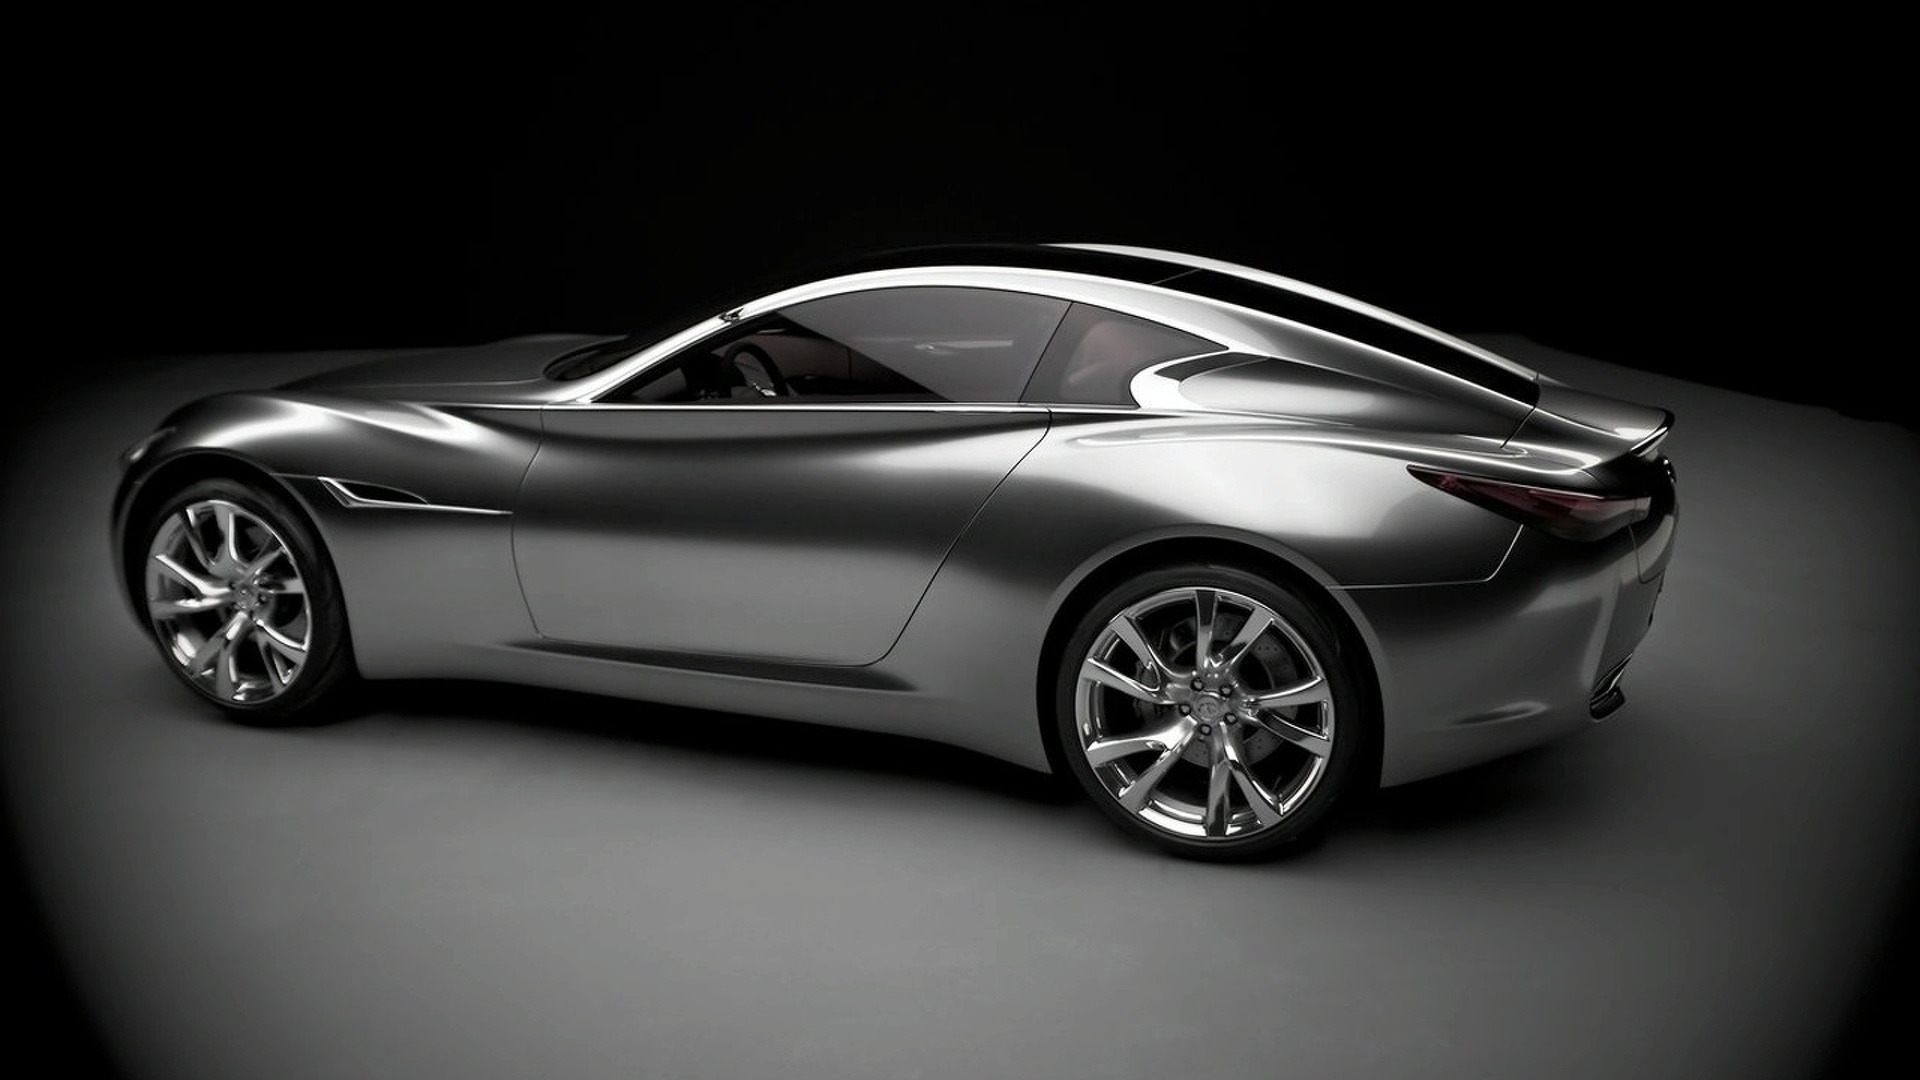 Infiniti considering GT-R-based sports car